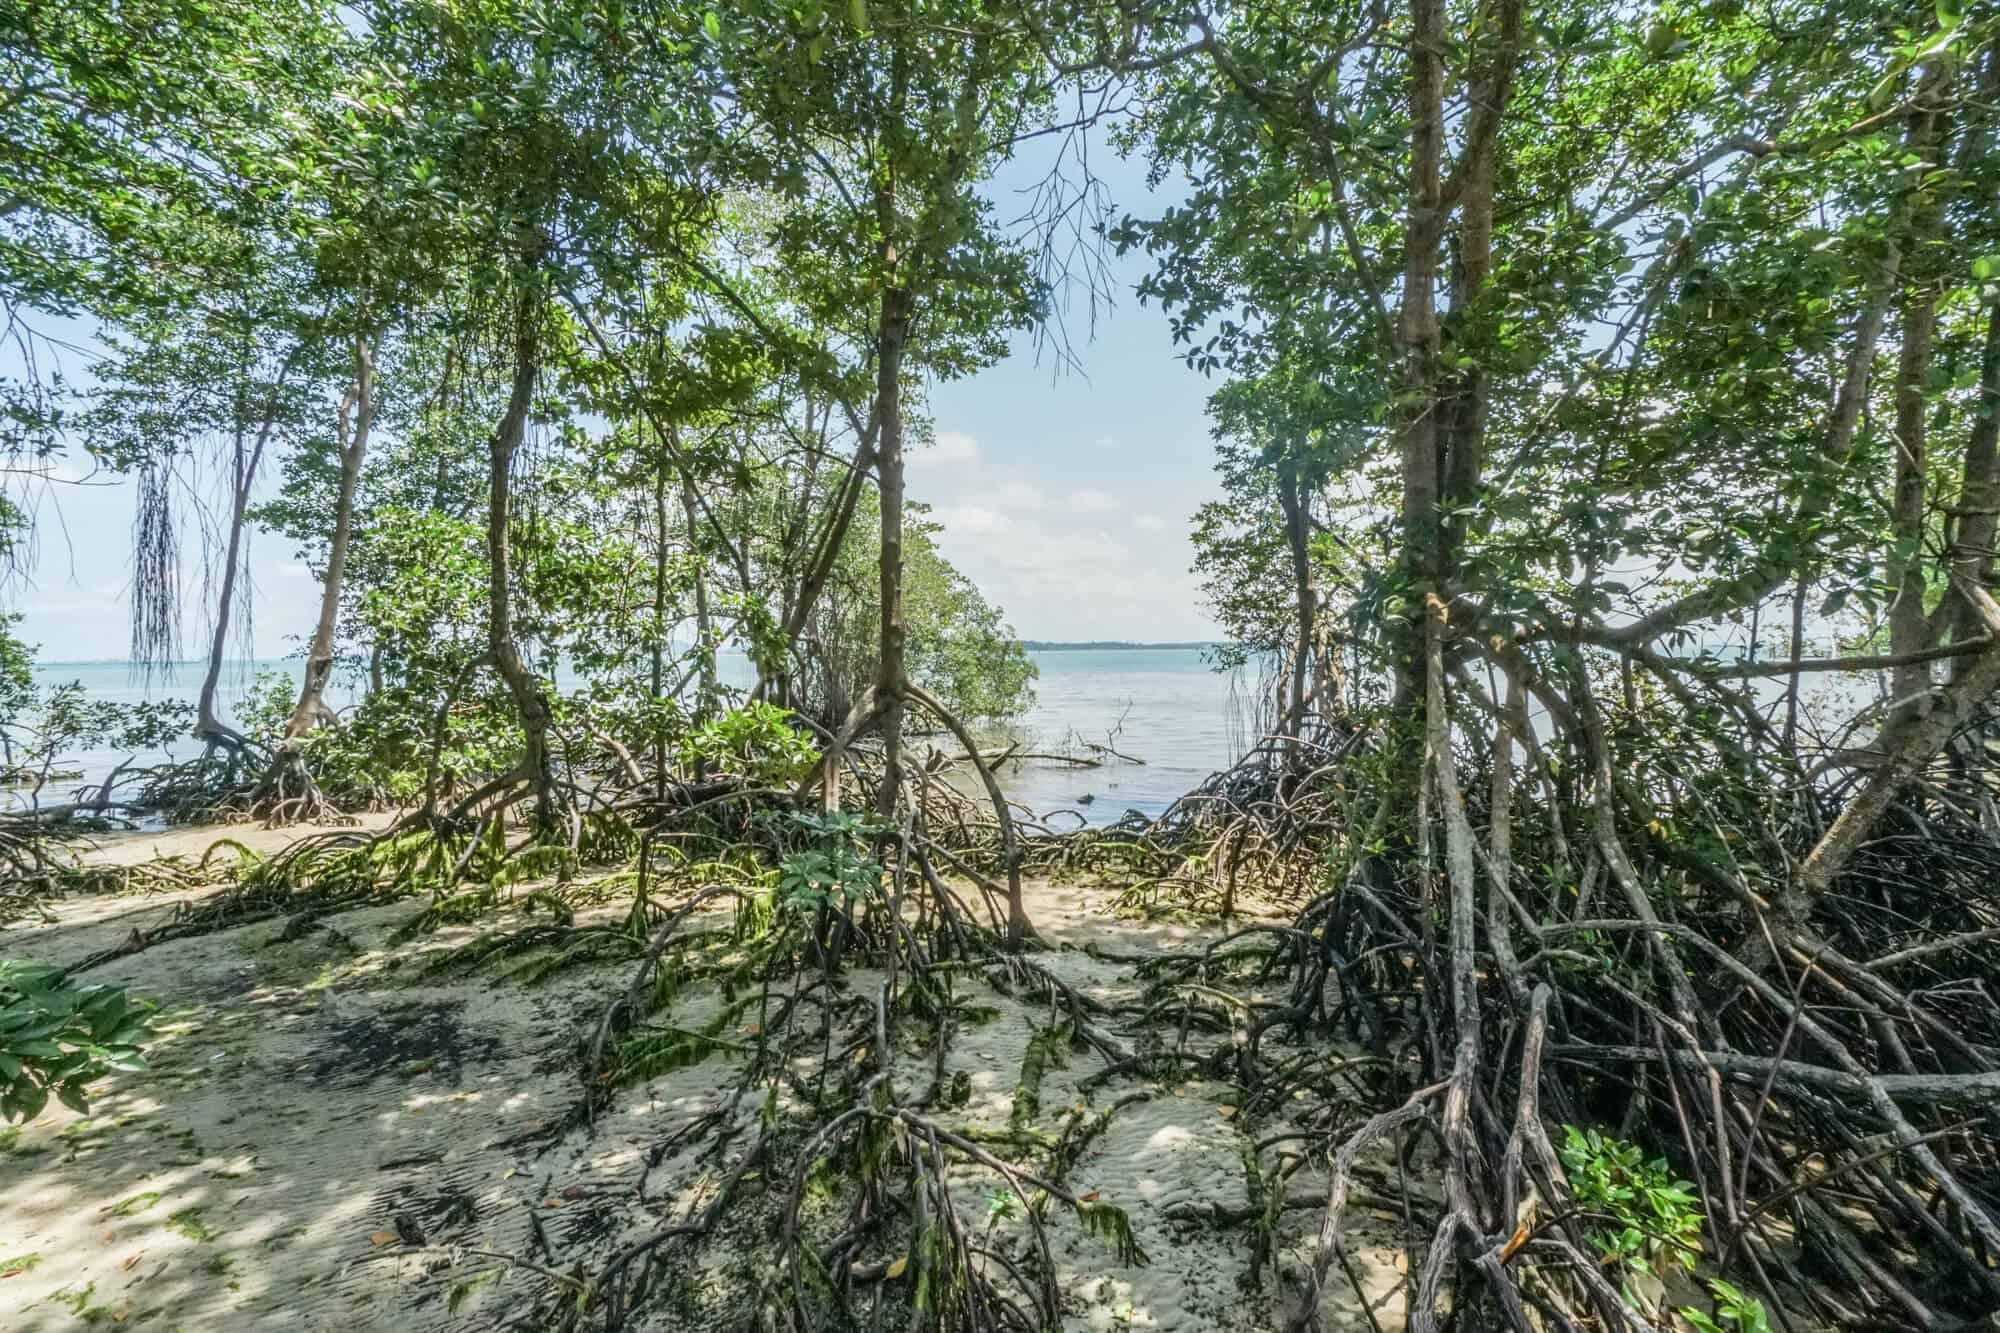 Pulau Ubin Check Jawa Wetlands Mangroven